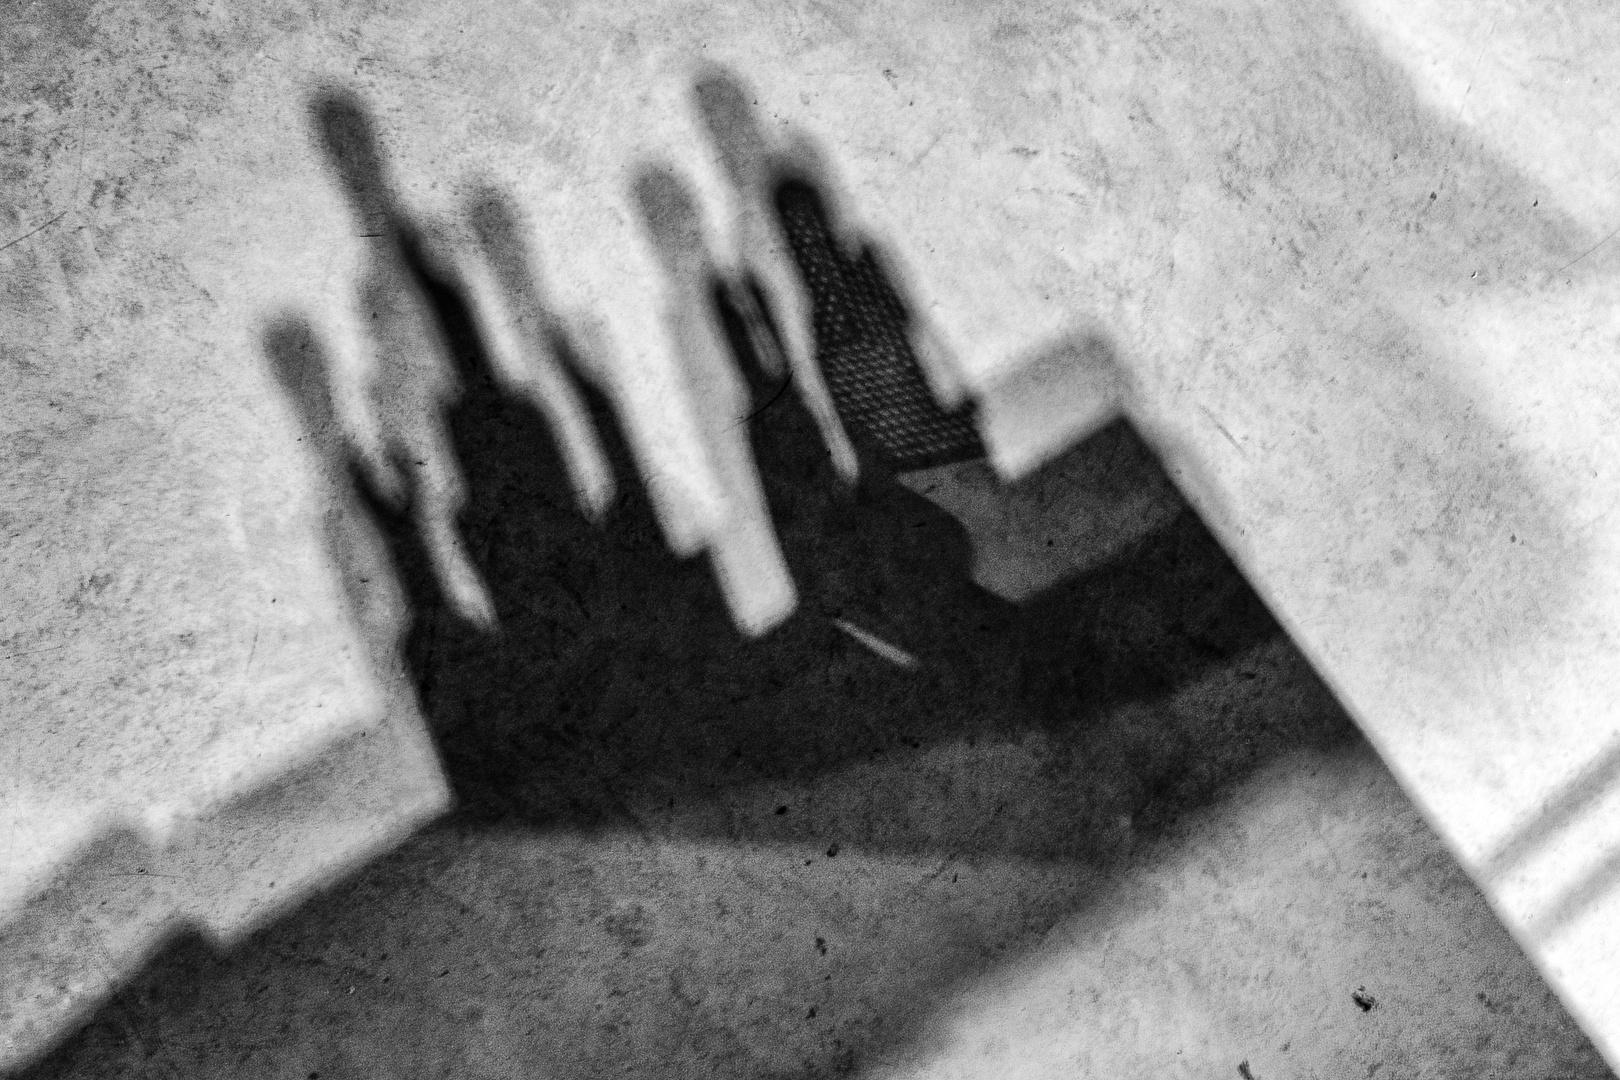 ... shadow-people on  floor ...